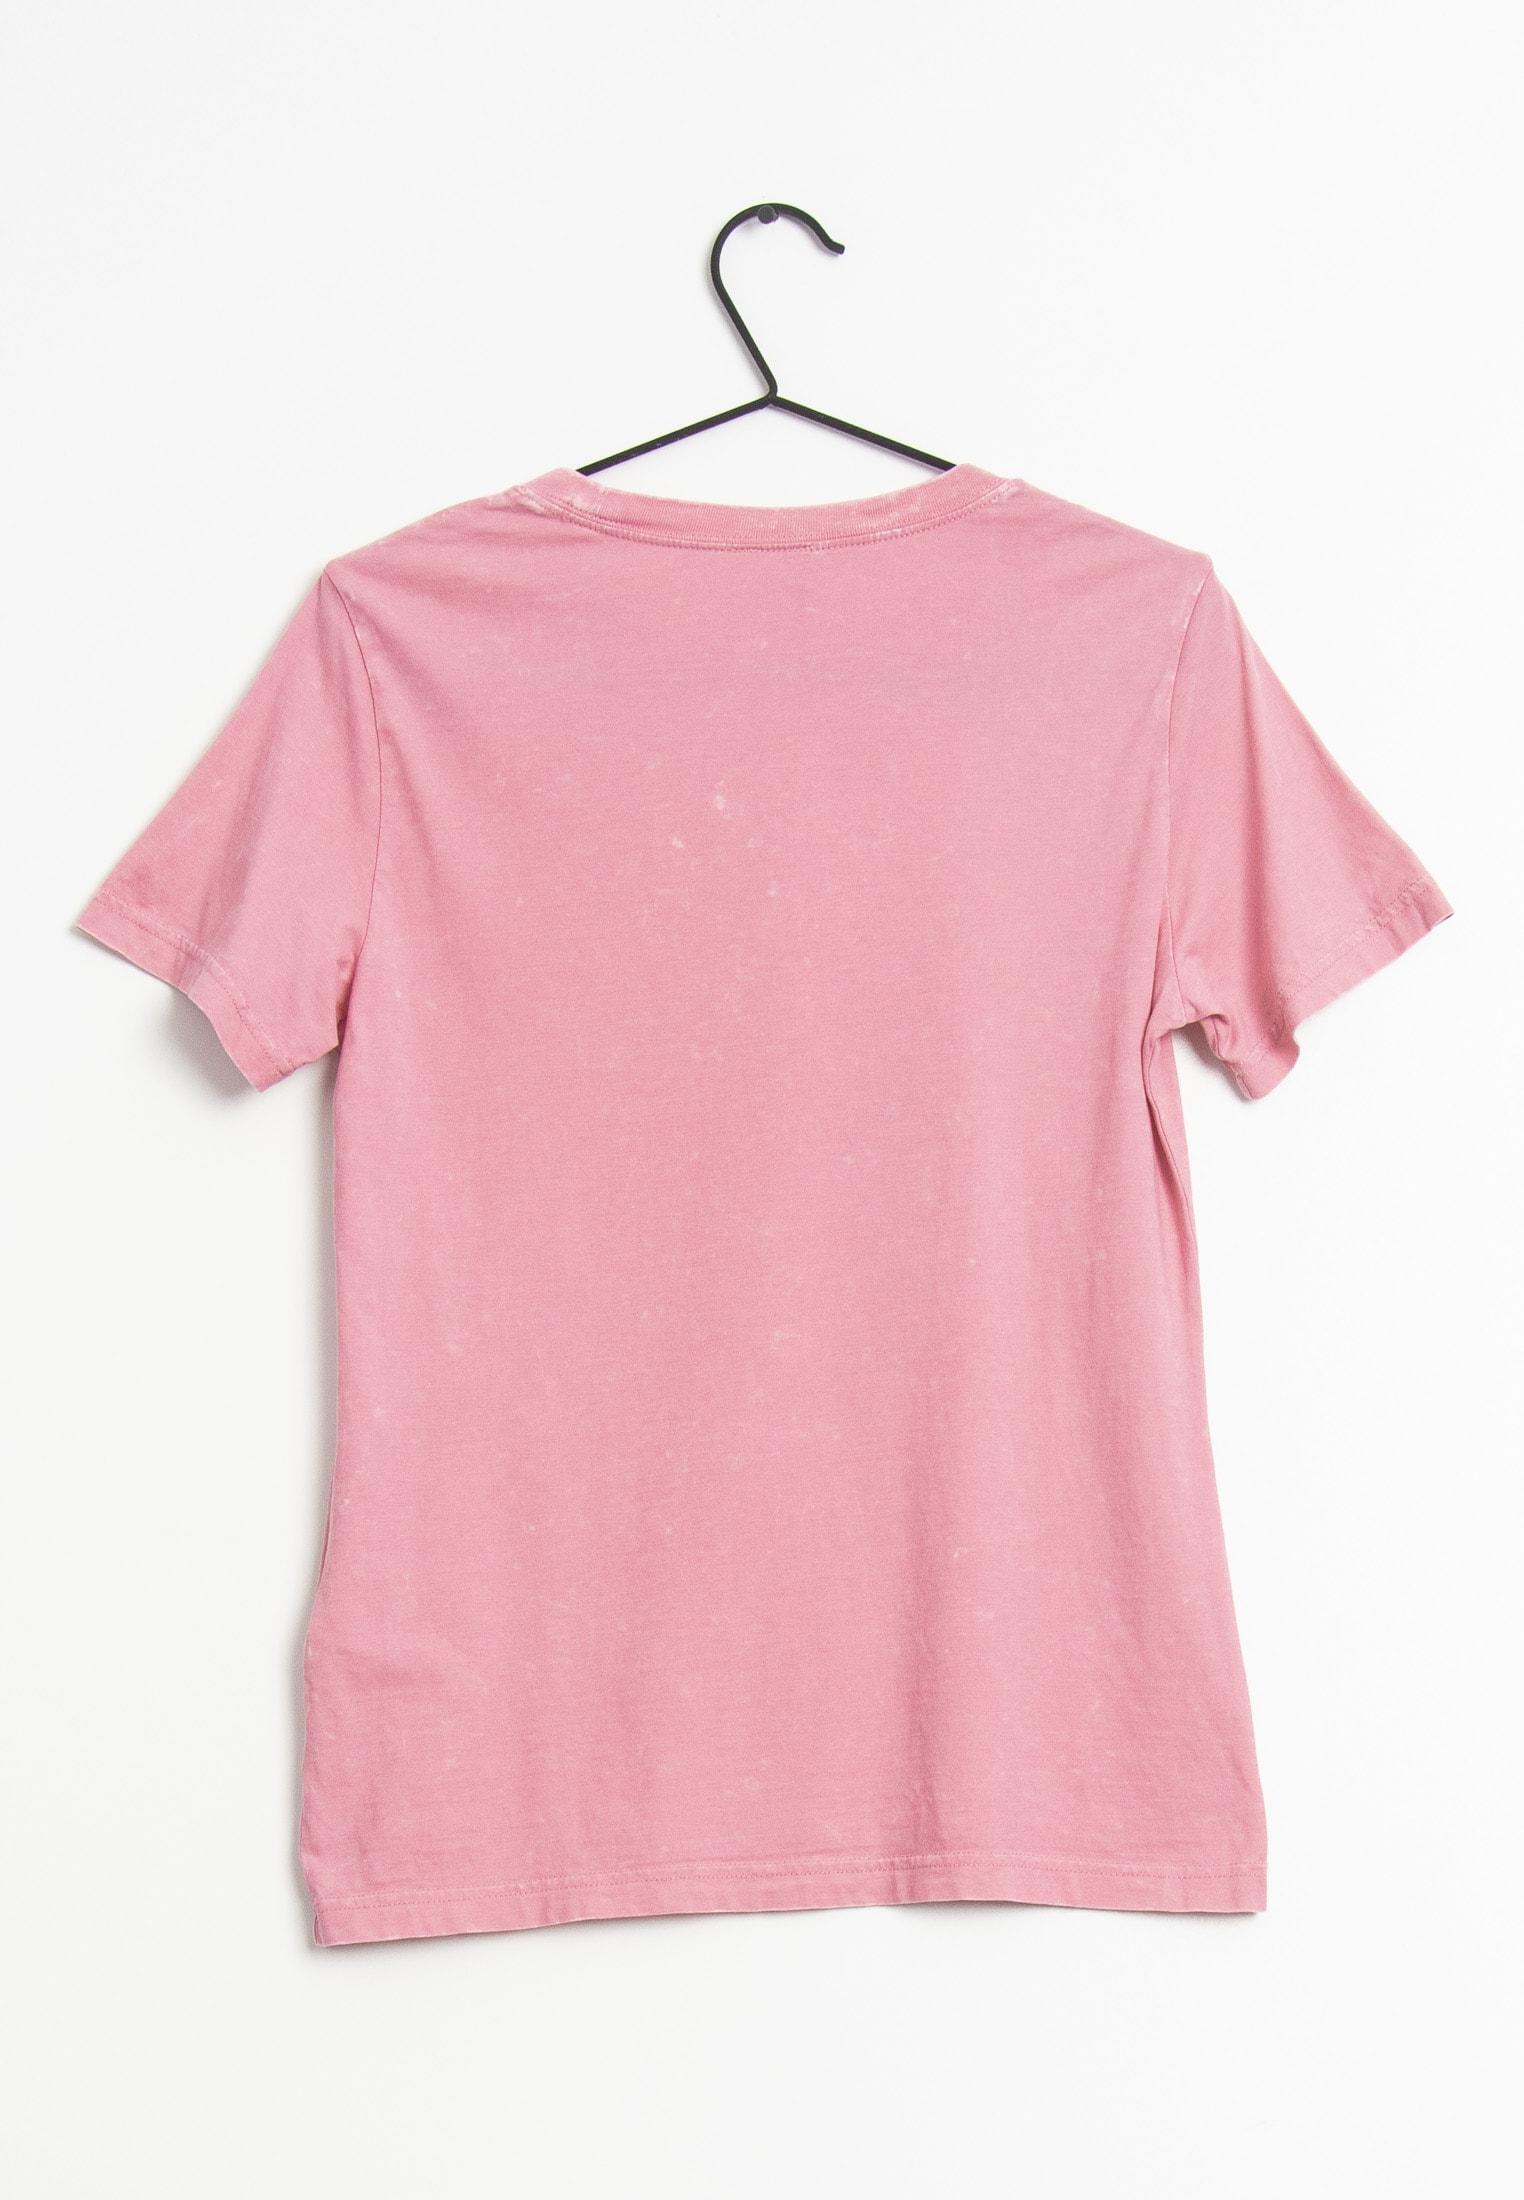 & other stories T-Shirt Blau Gr.34